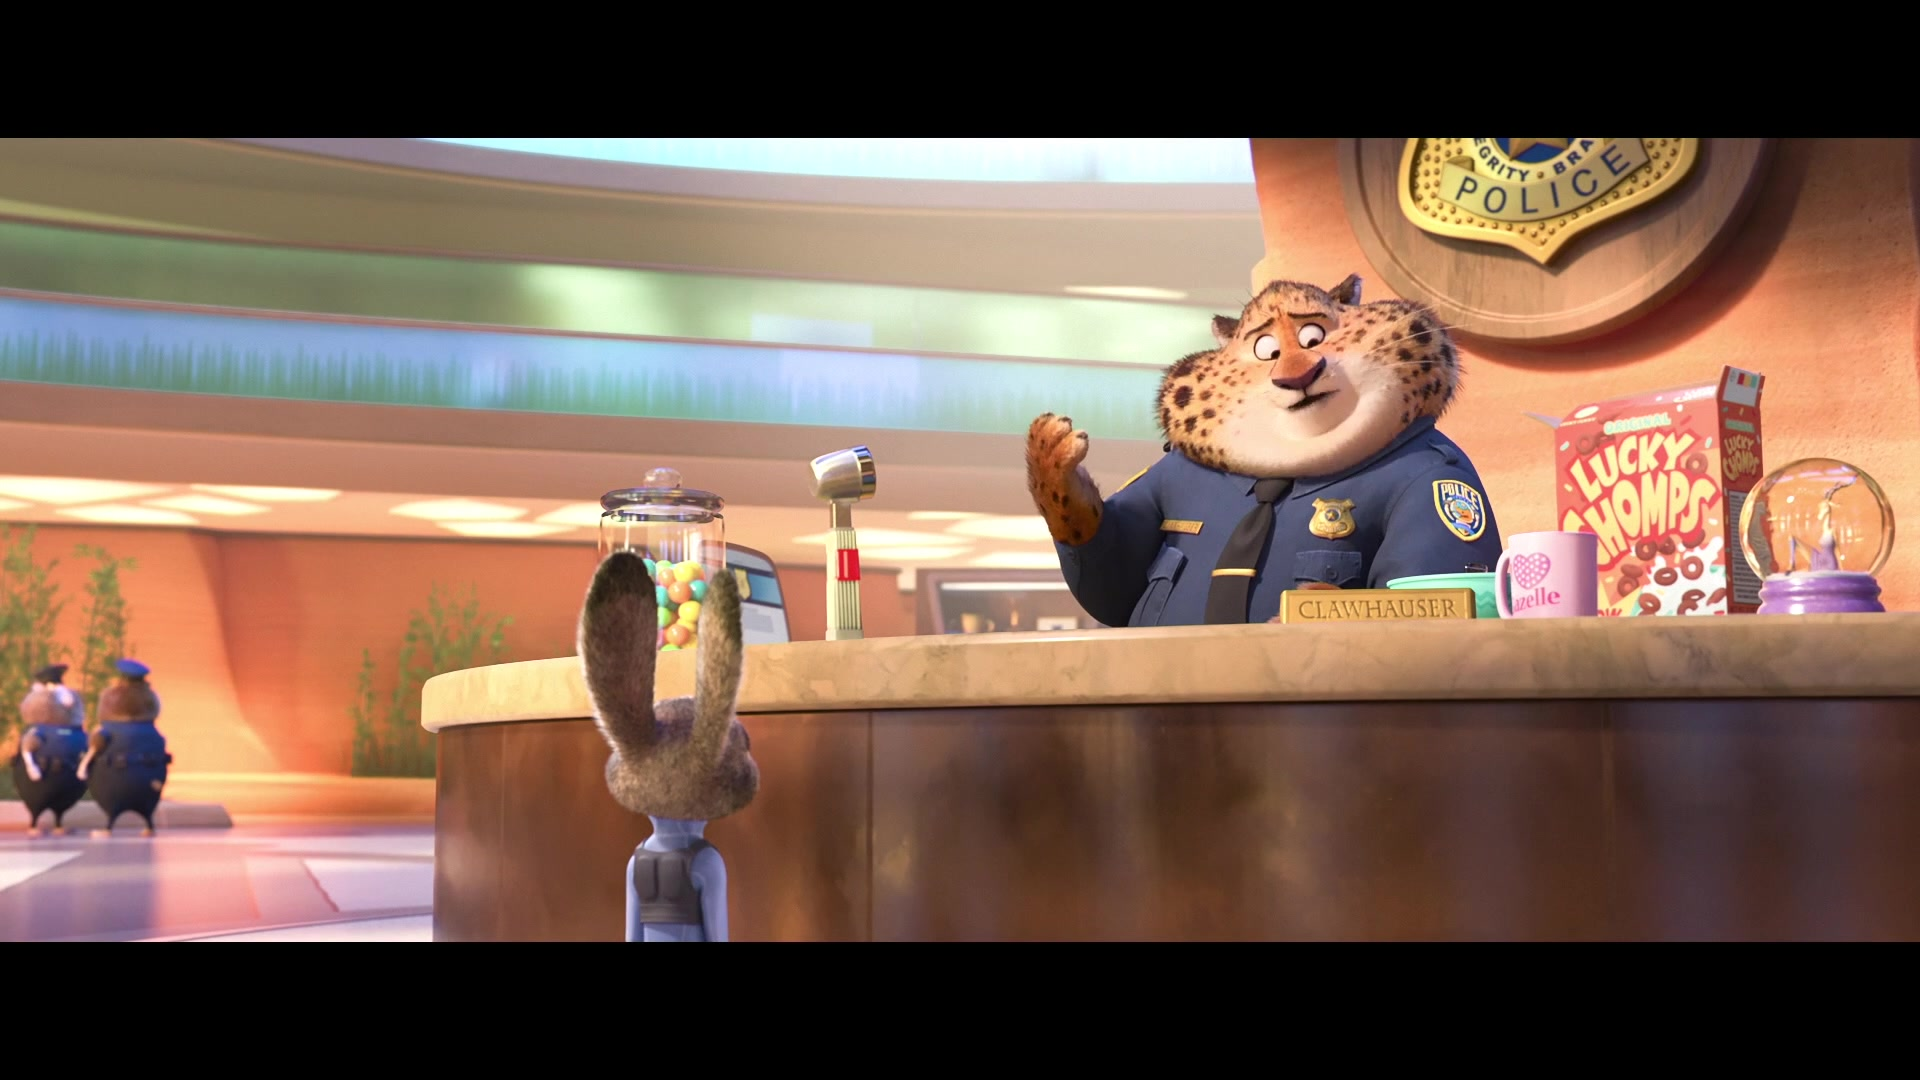 Get a Sneak Peek at Disney's 'Zootopia'